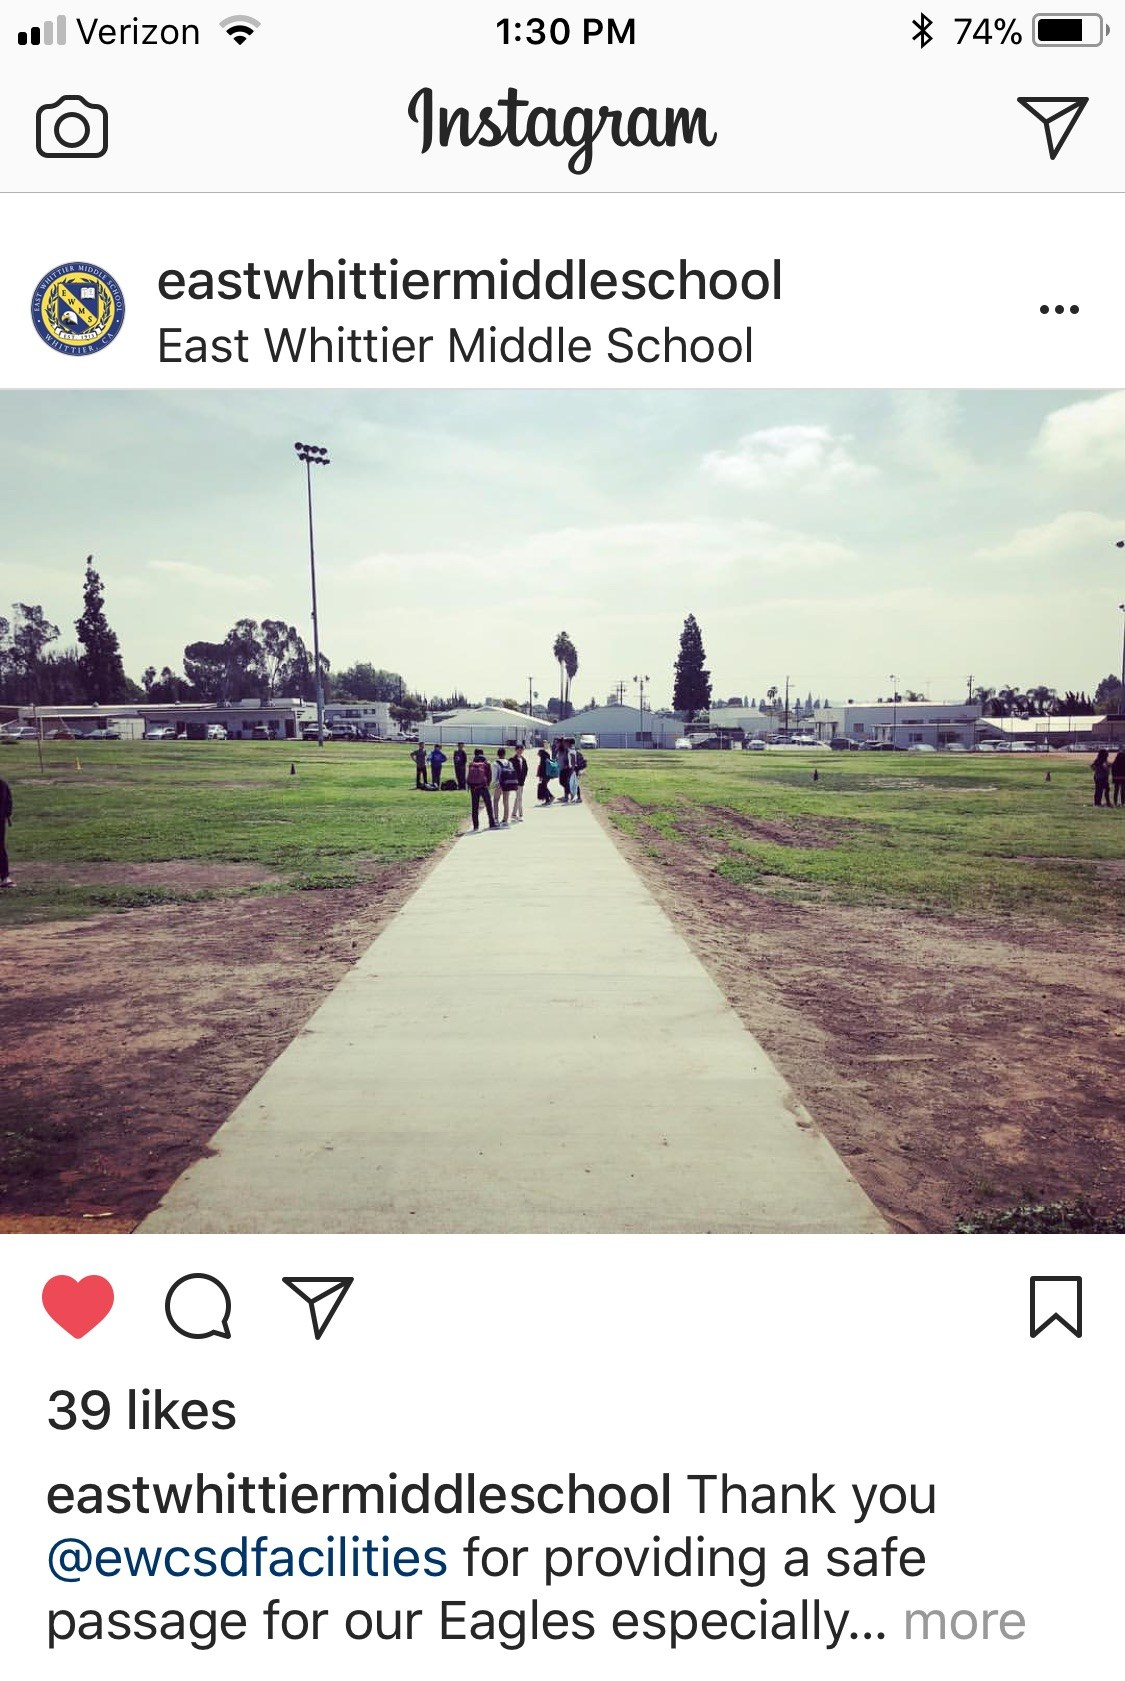 ewms walkway